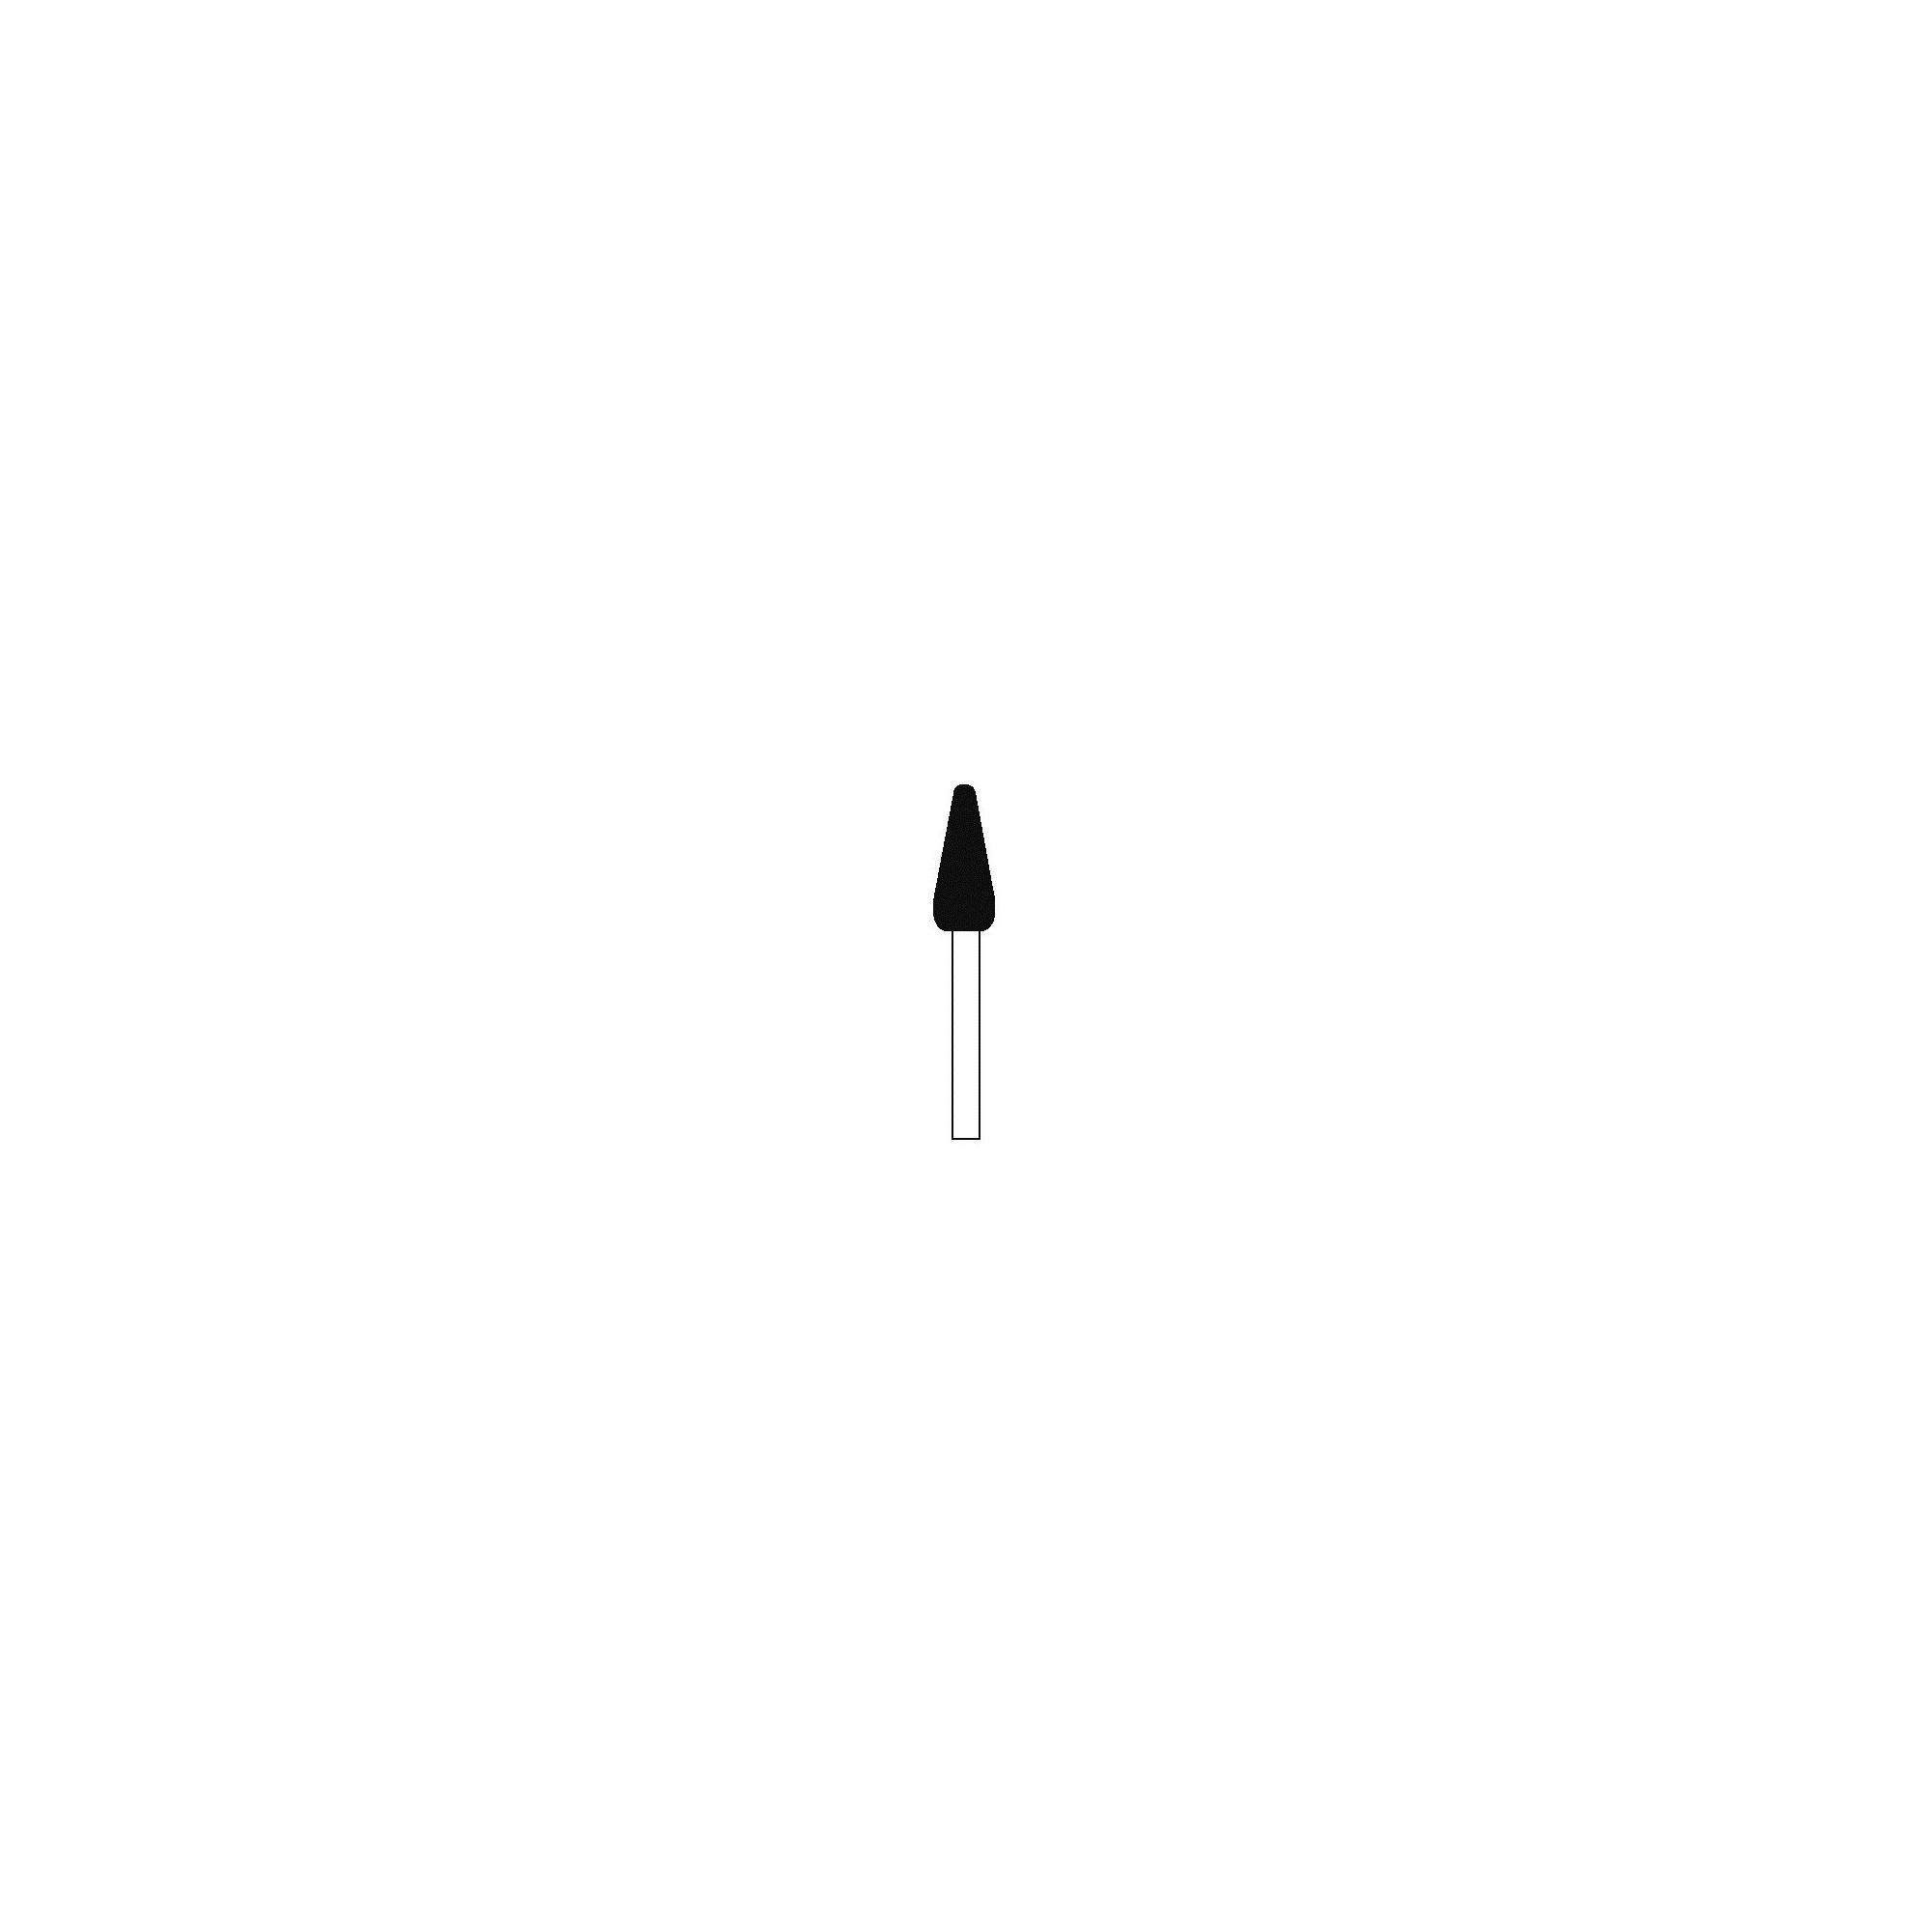 Fraise 45013312 Diamant - Orthoplasties - Grain fin - 2,35mm